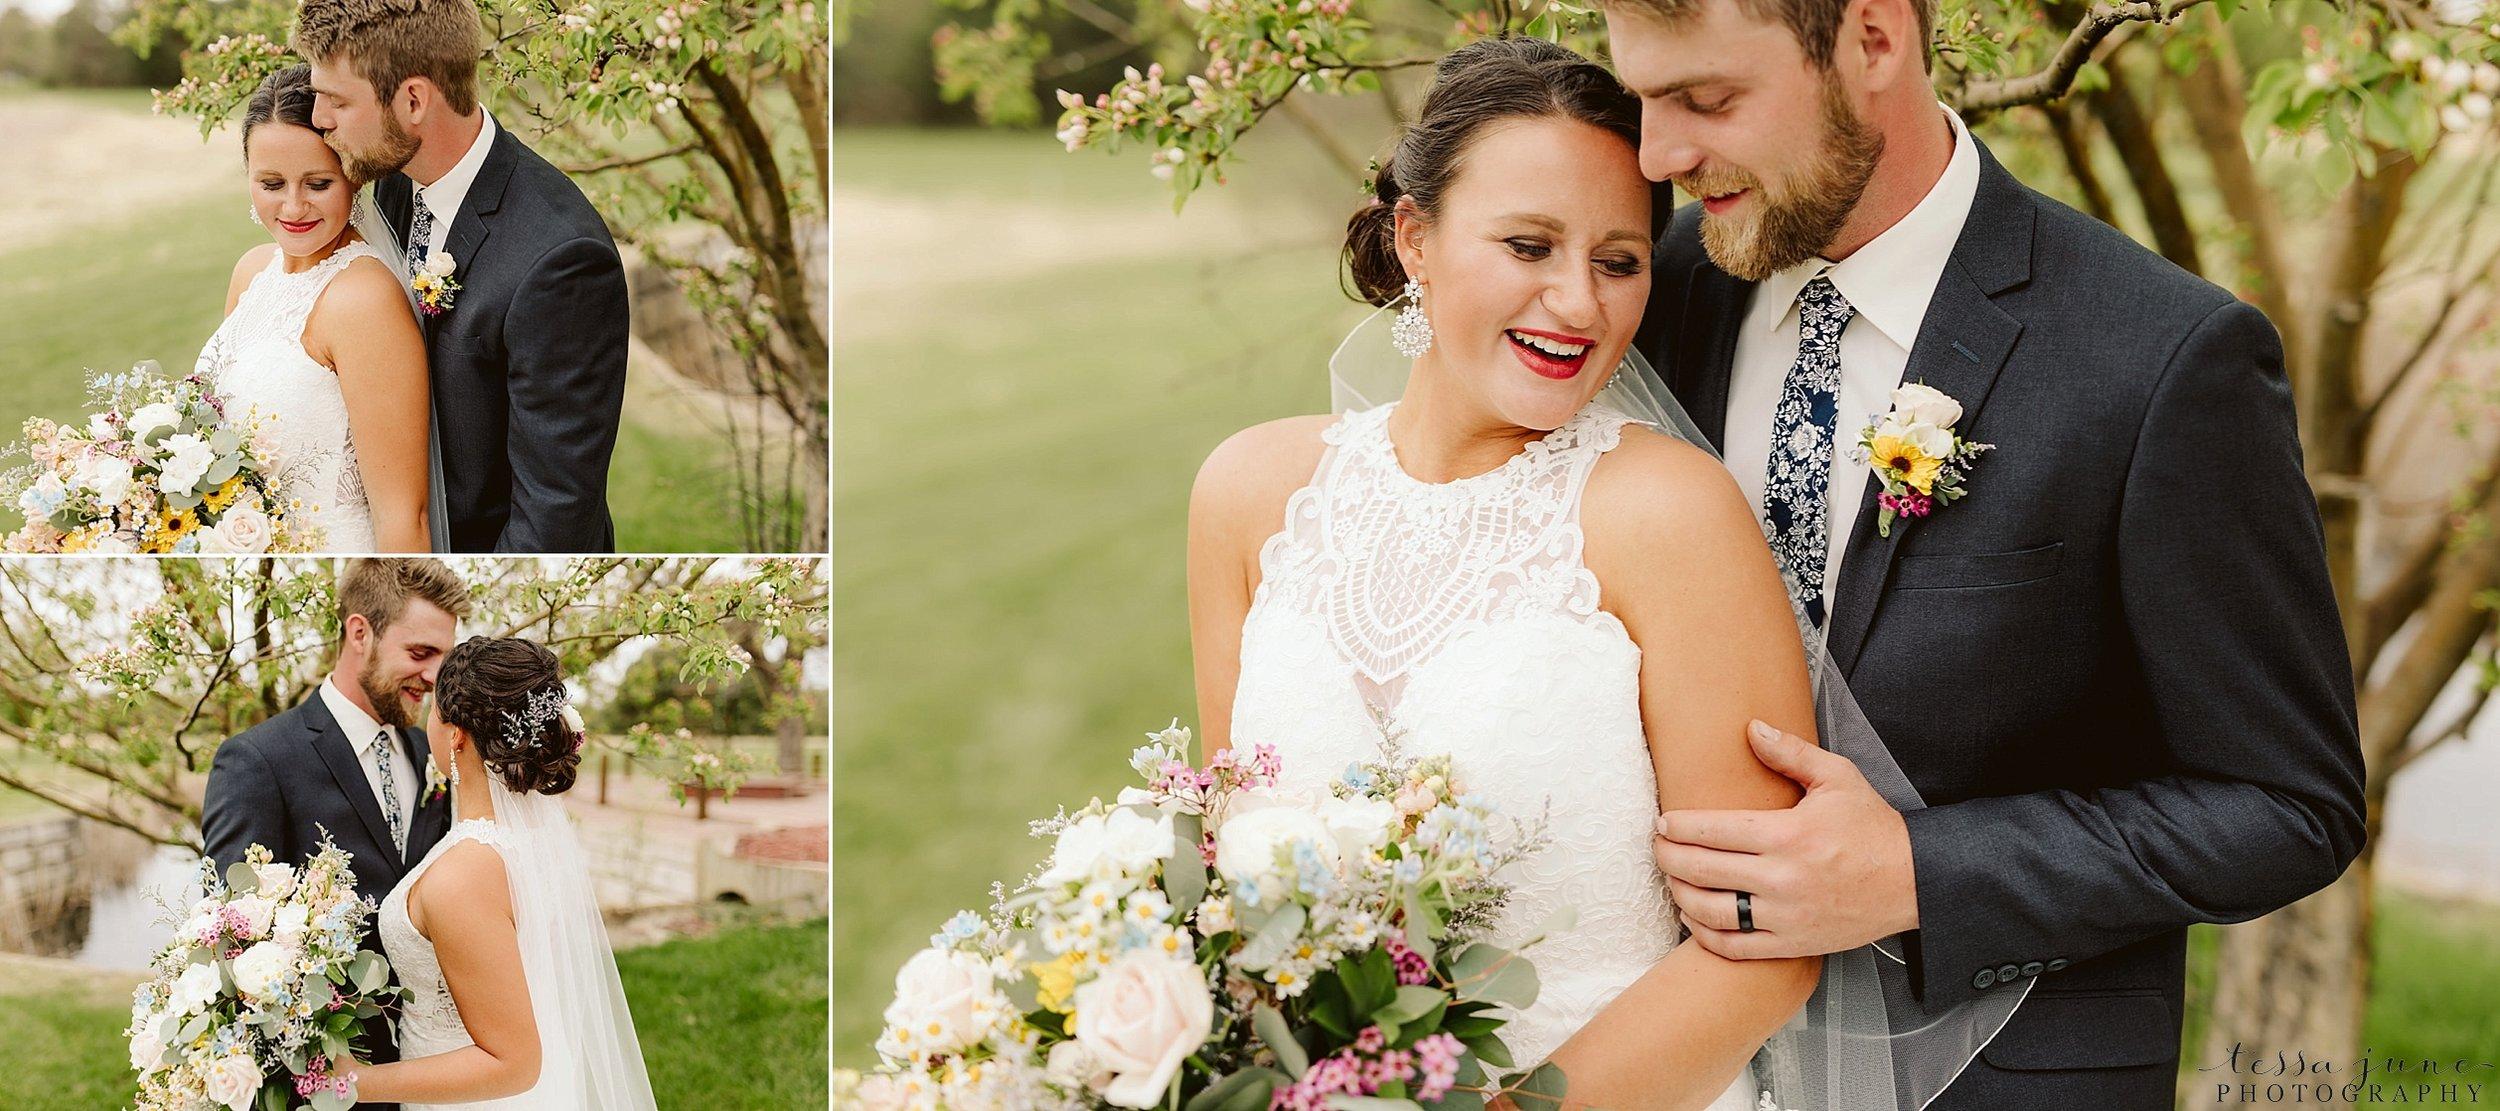 The-grands-at-mulligans-wedding-sartell-minnesota-spring-floral-spring-garden-wedding-55.jpg